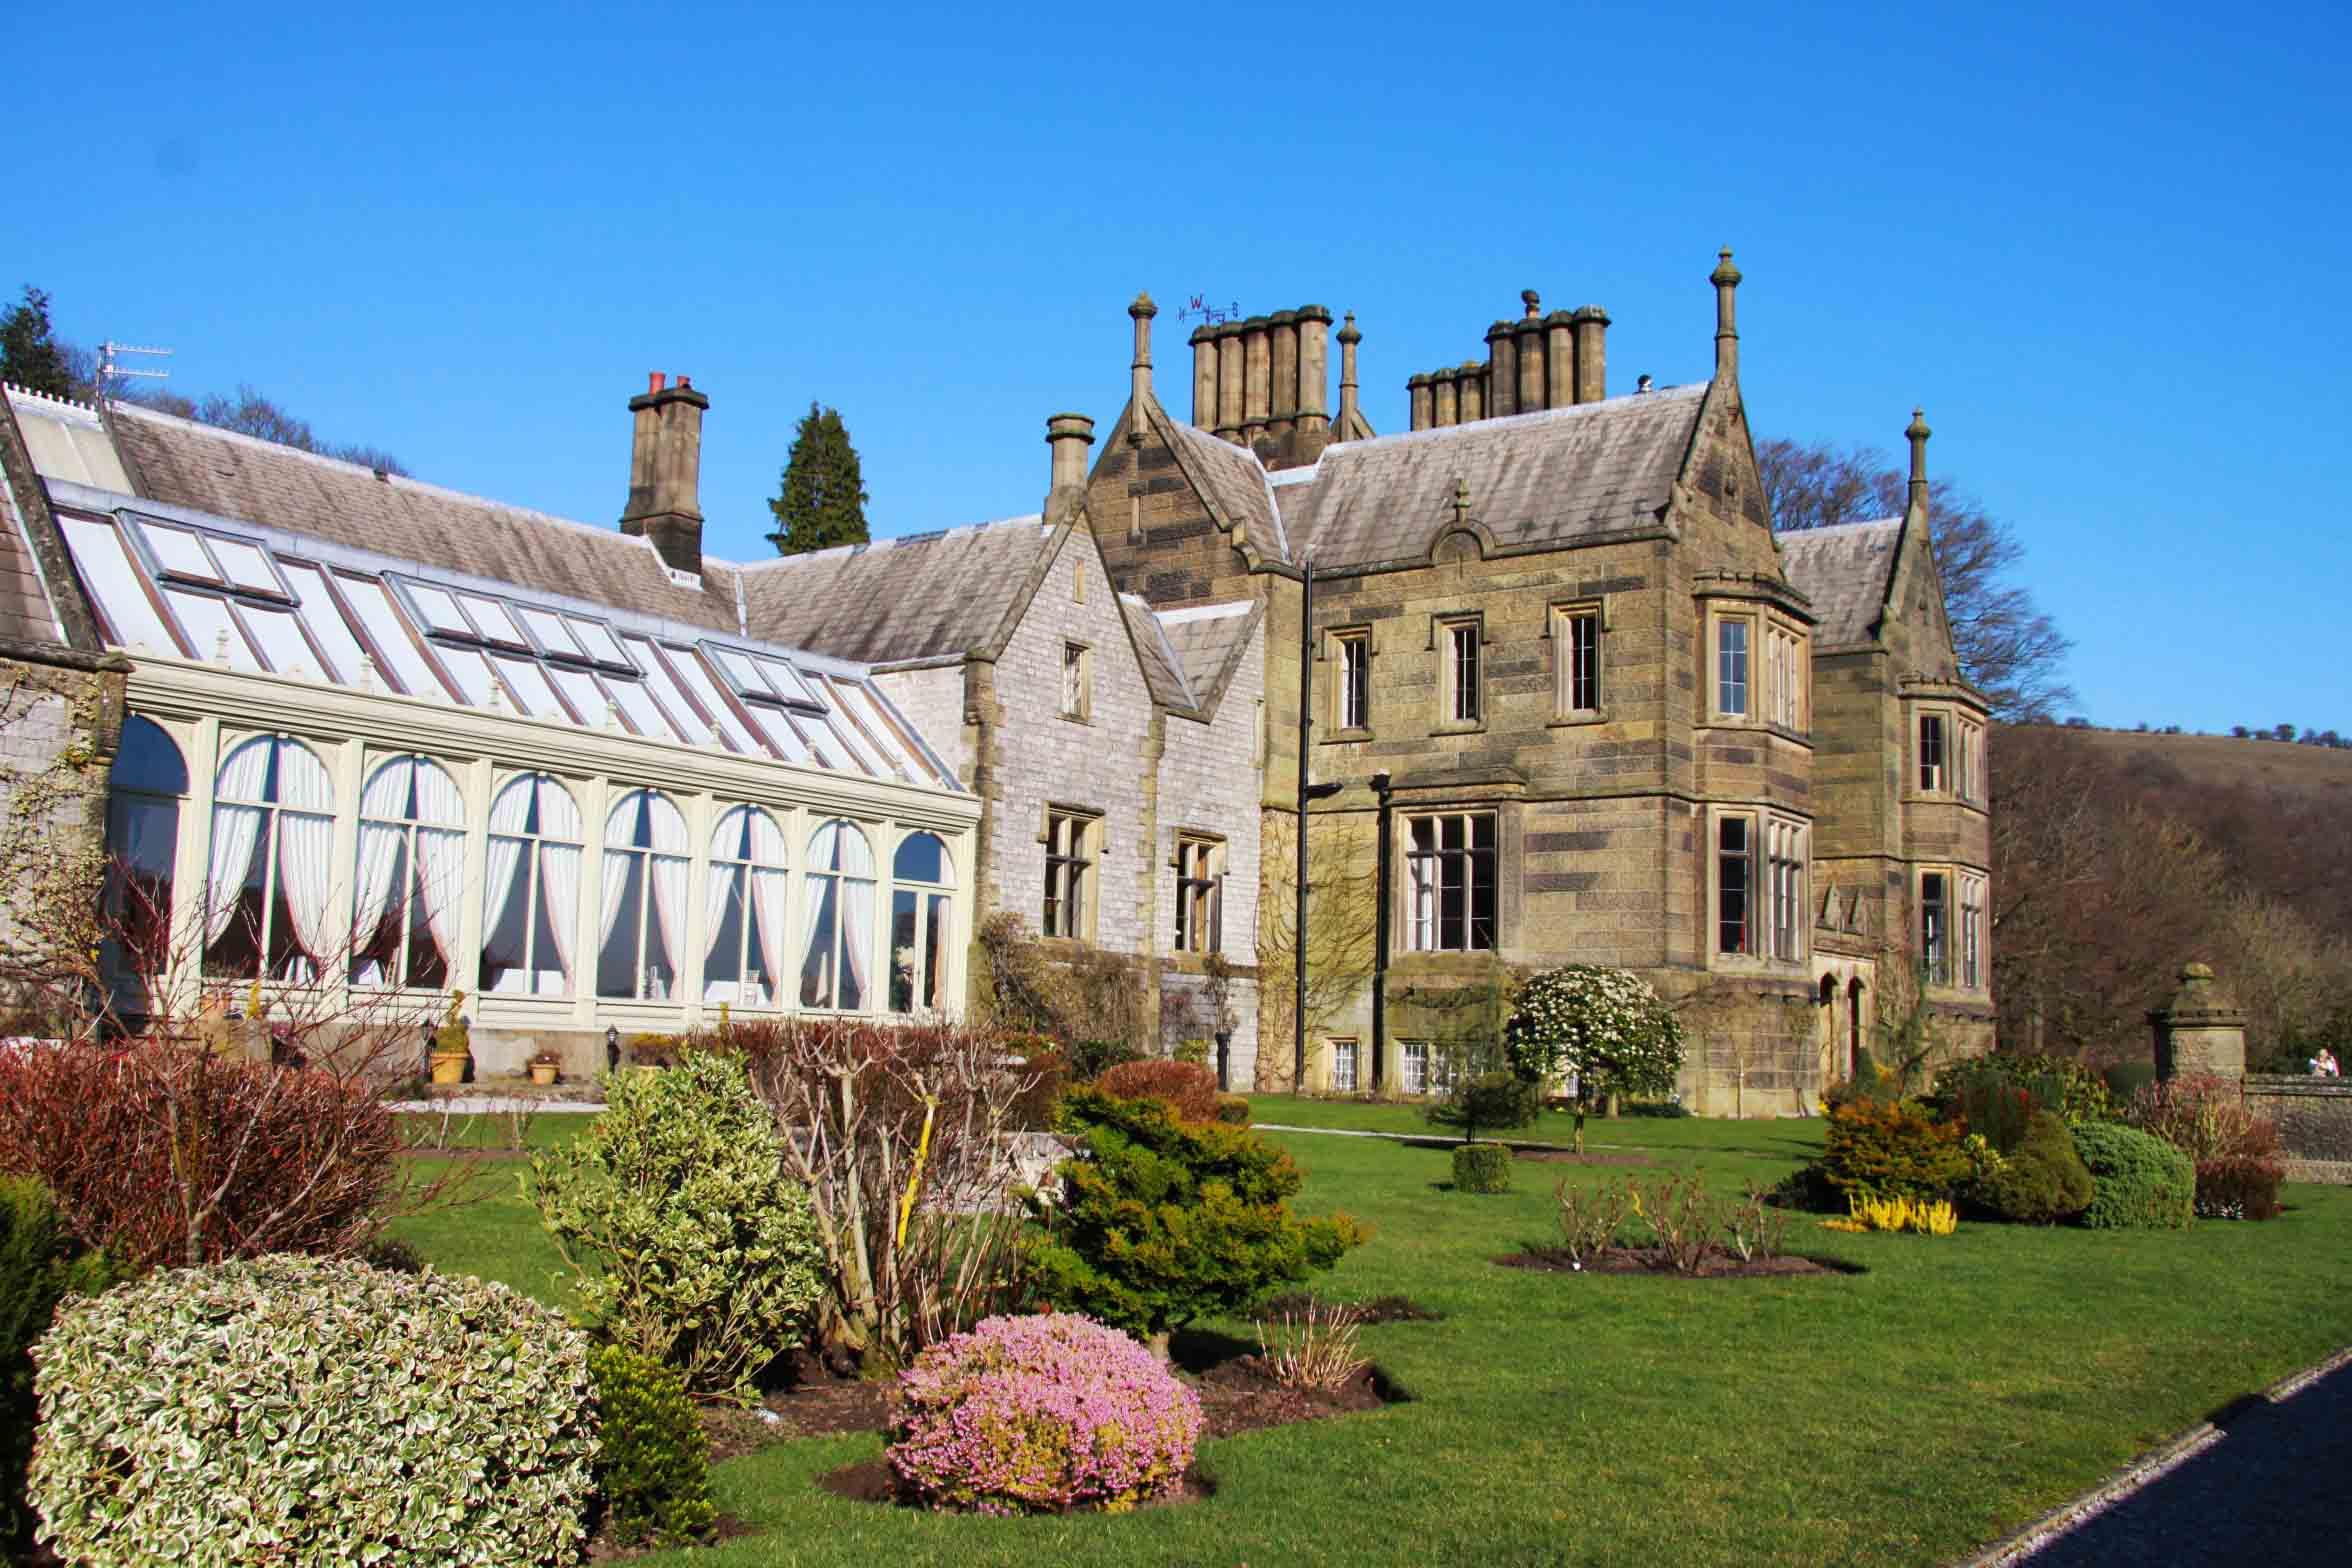 Cressbrook Hall, Derbyshire